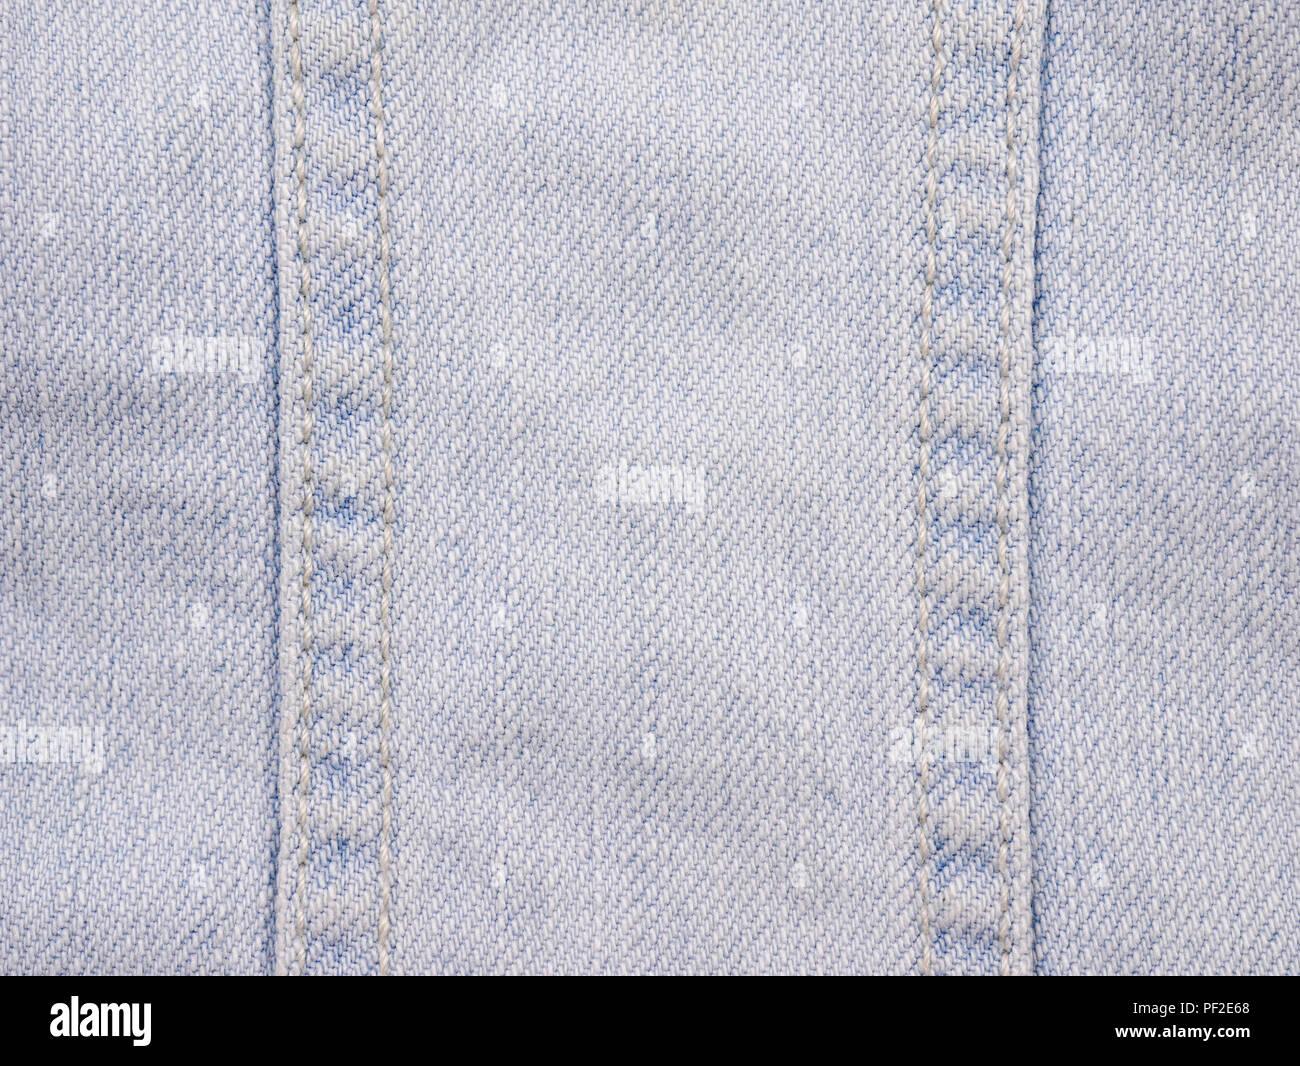 texture background light blue jean fabric cloth stock photo